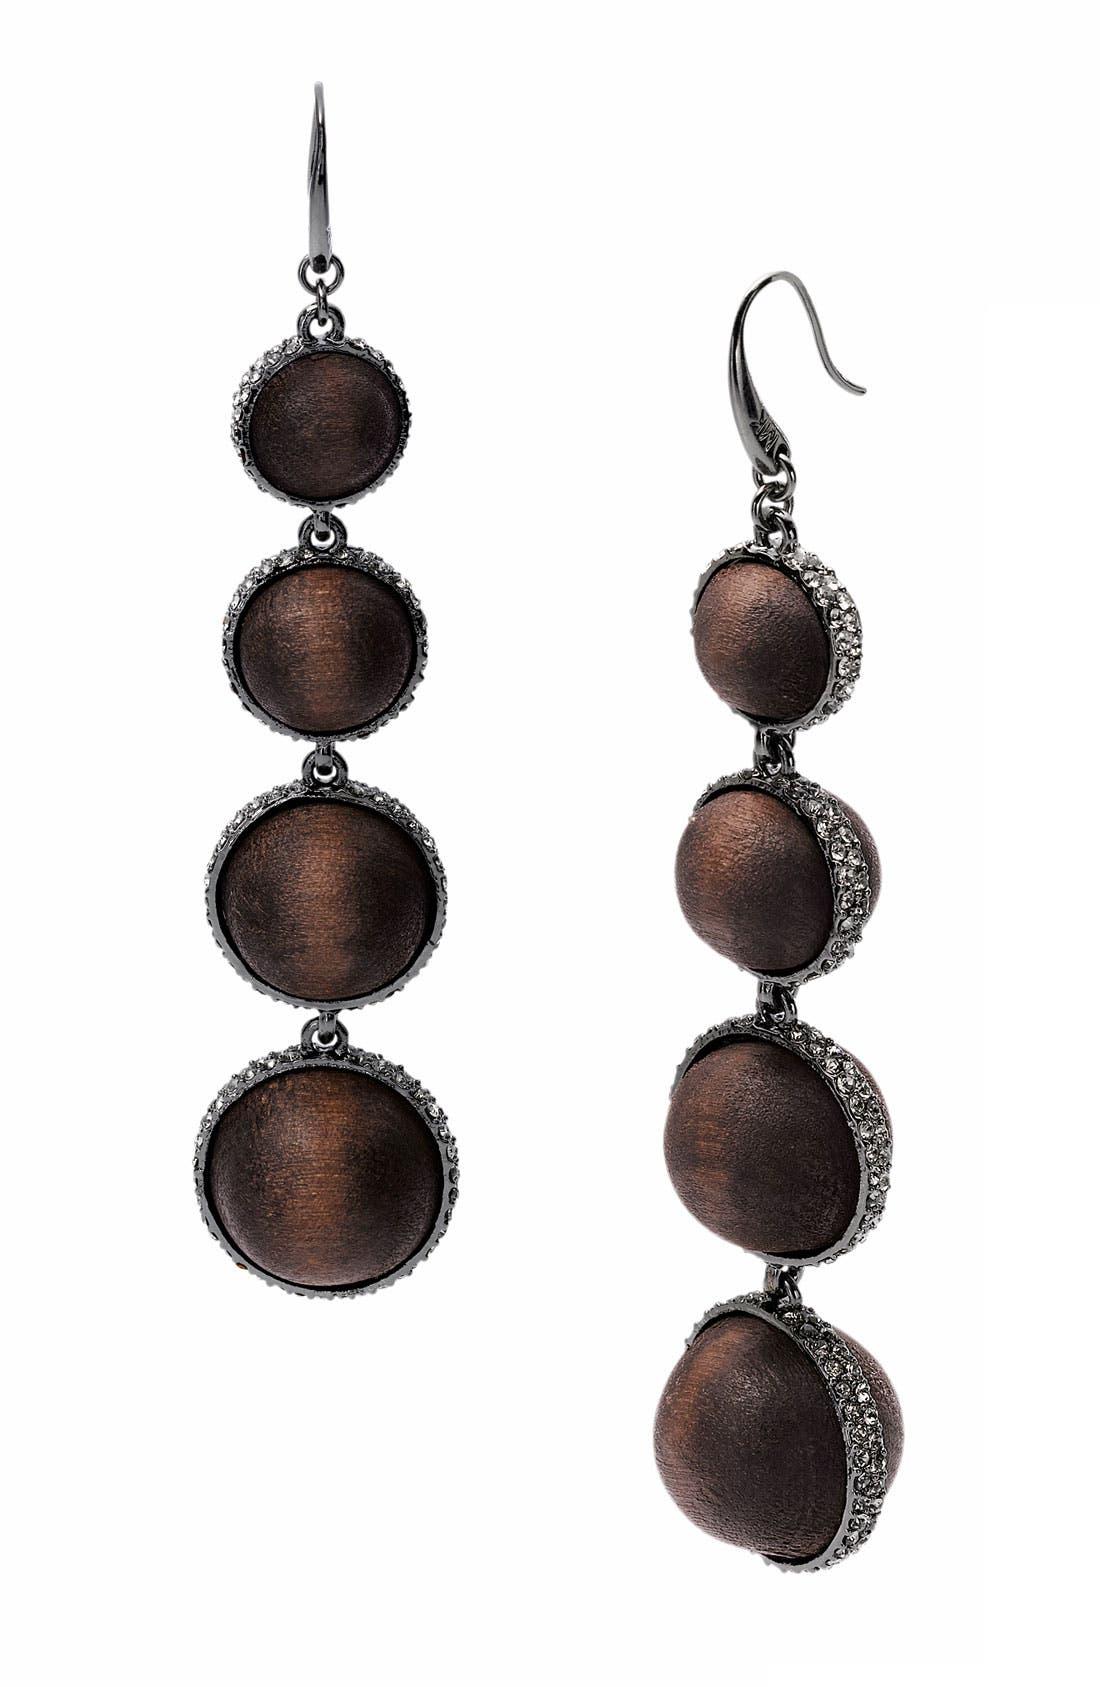 Alternate Image 1 Selected - Michael Kors 'Safari Glam' Pavé Slice Statement Earrings